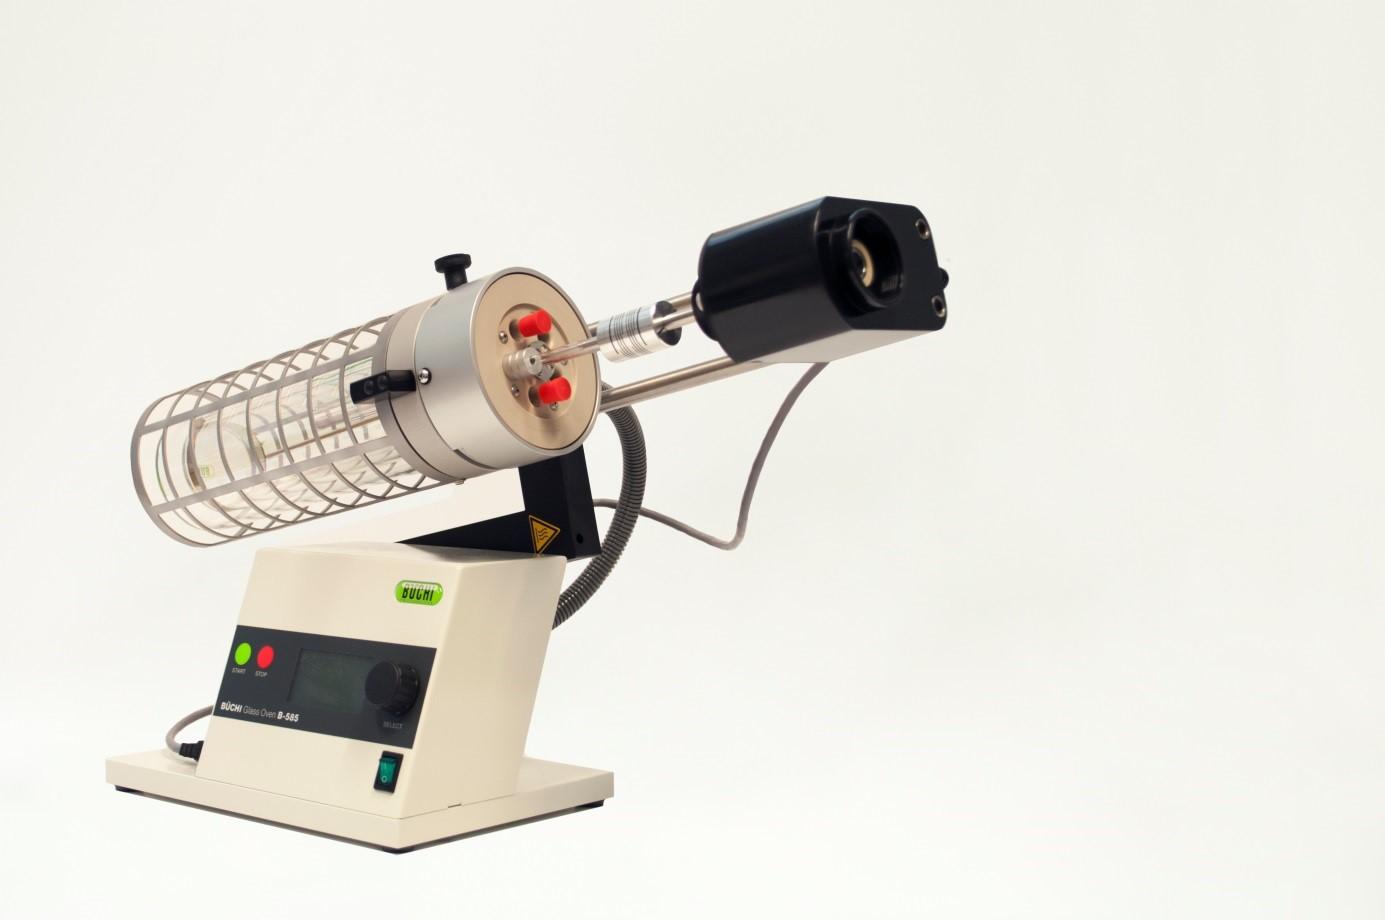 C02-tester